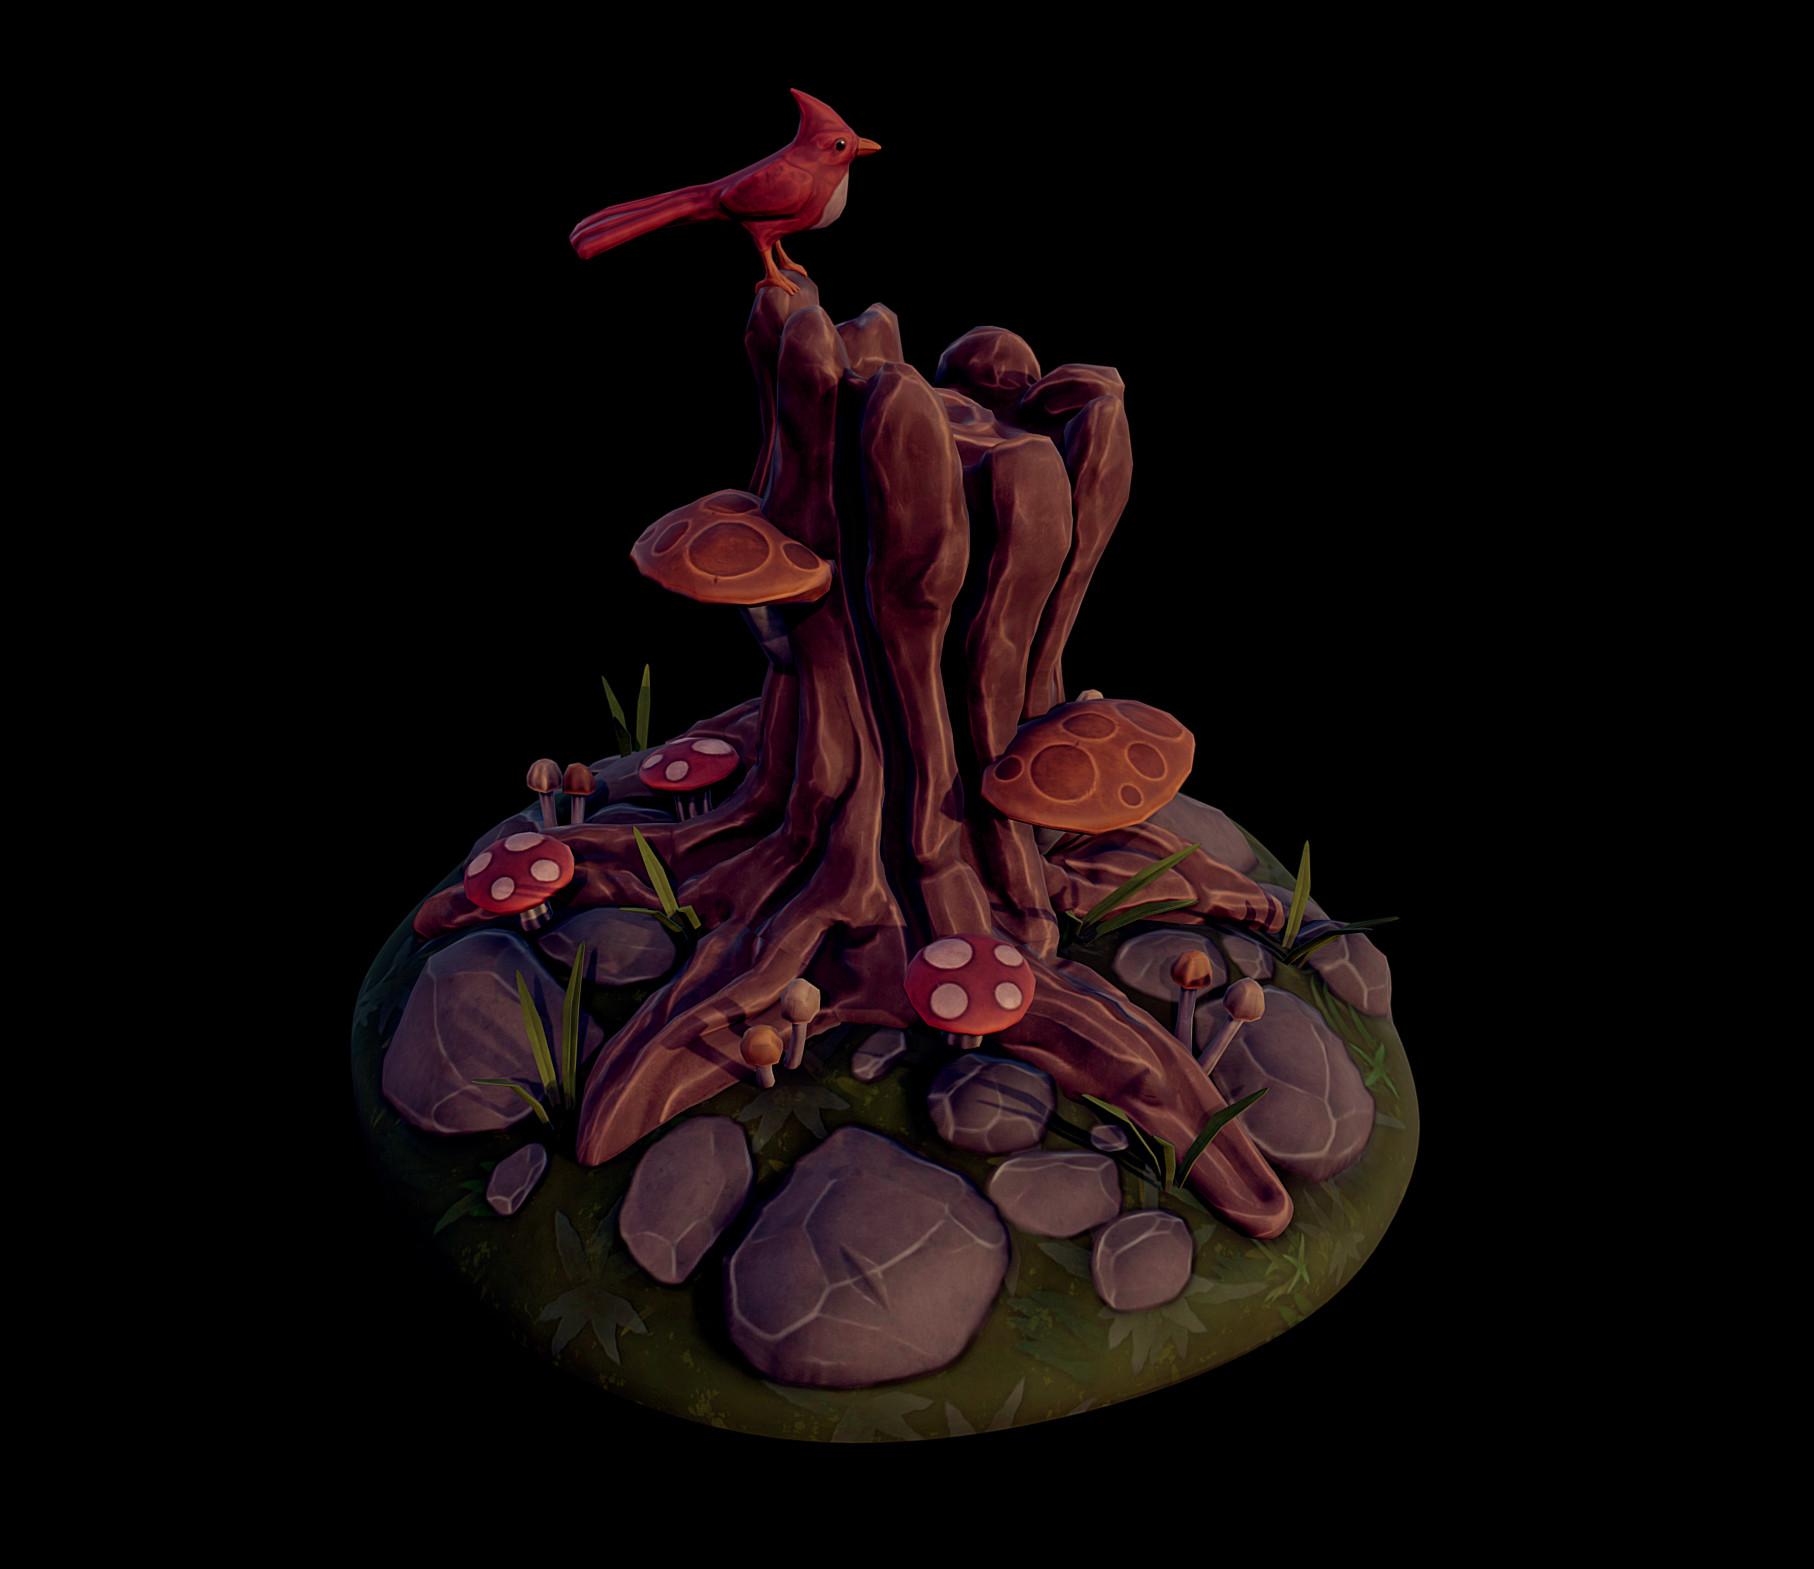 Robert max ramirez stump2